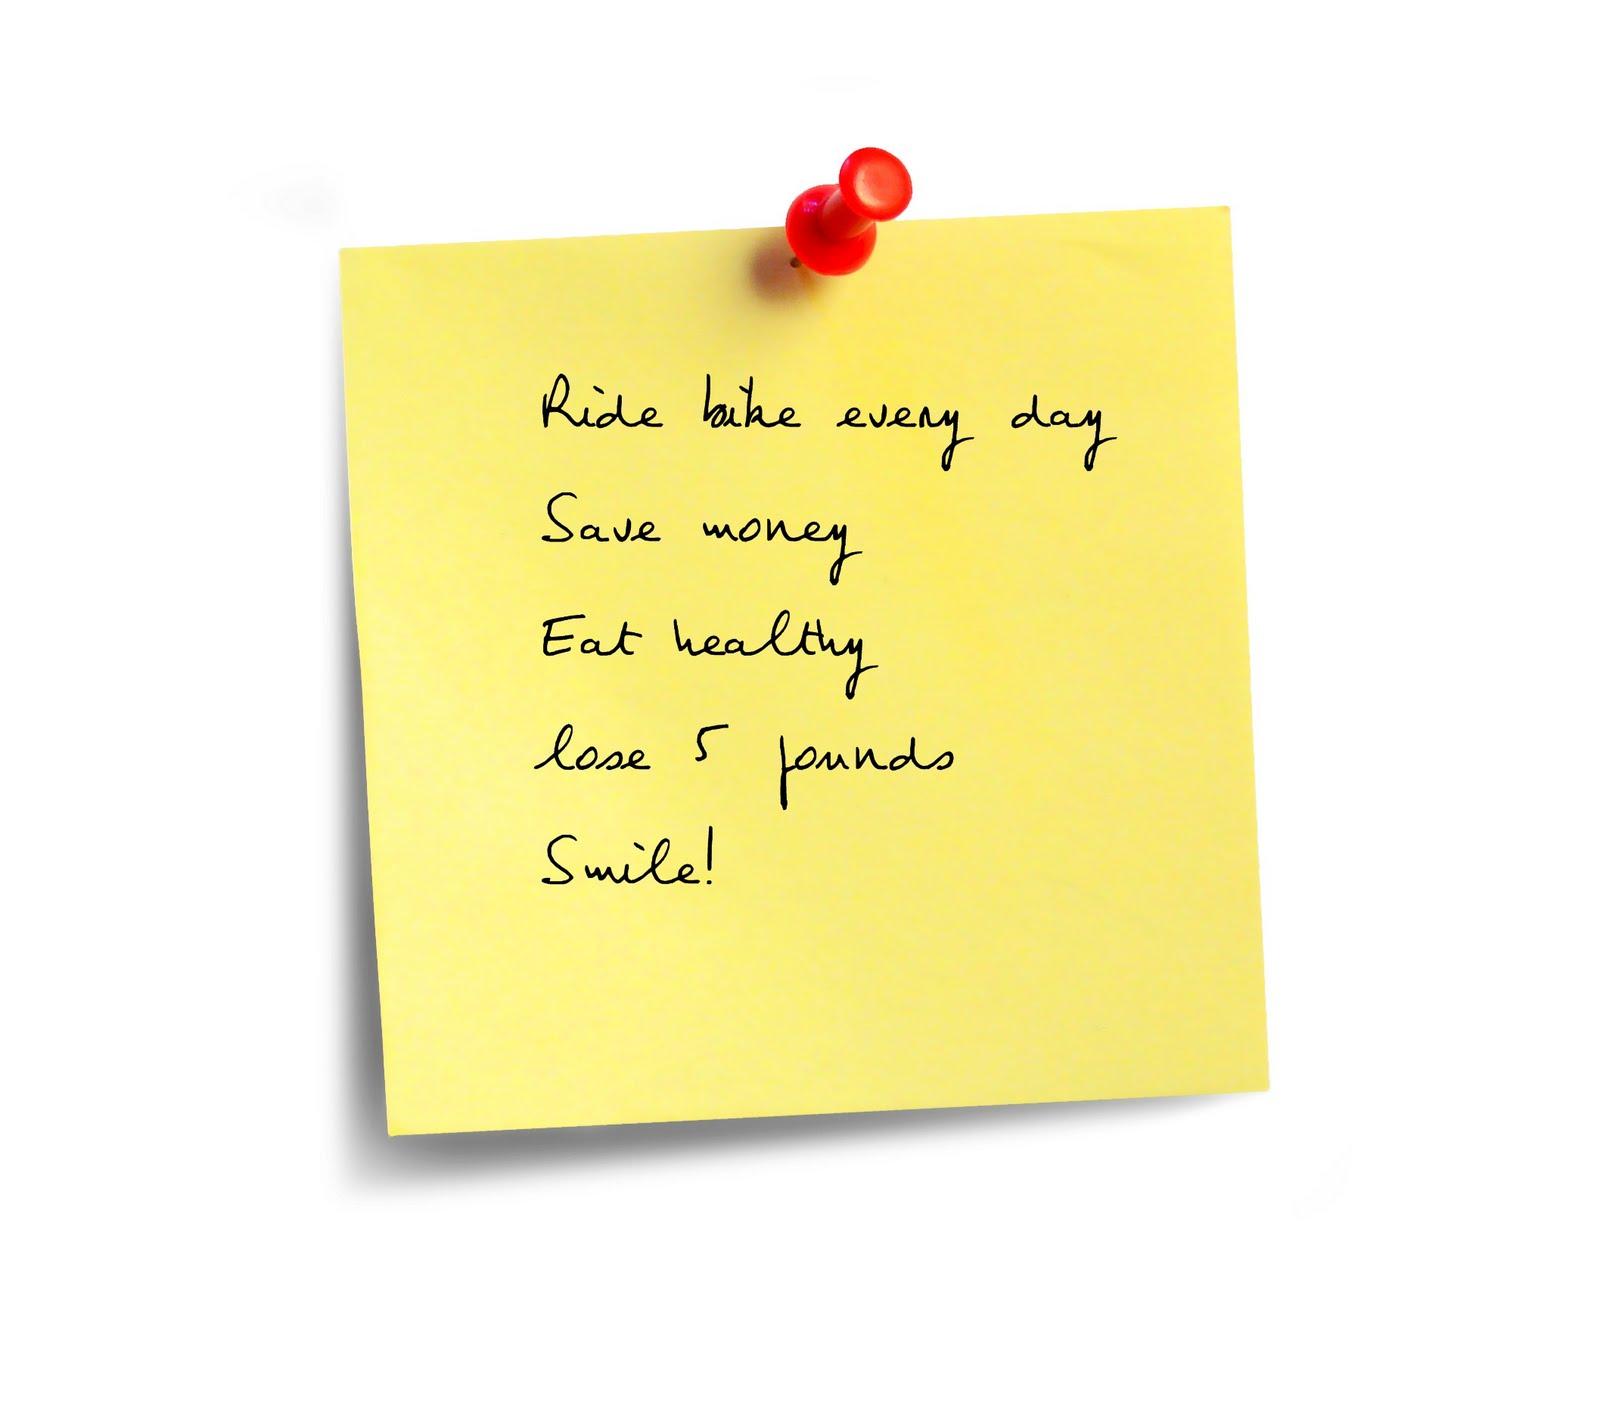 Reminder Note Reminder notes everywhere!